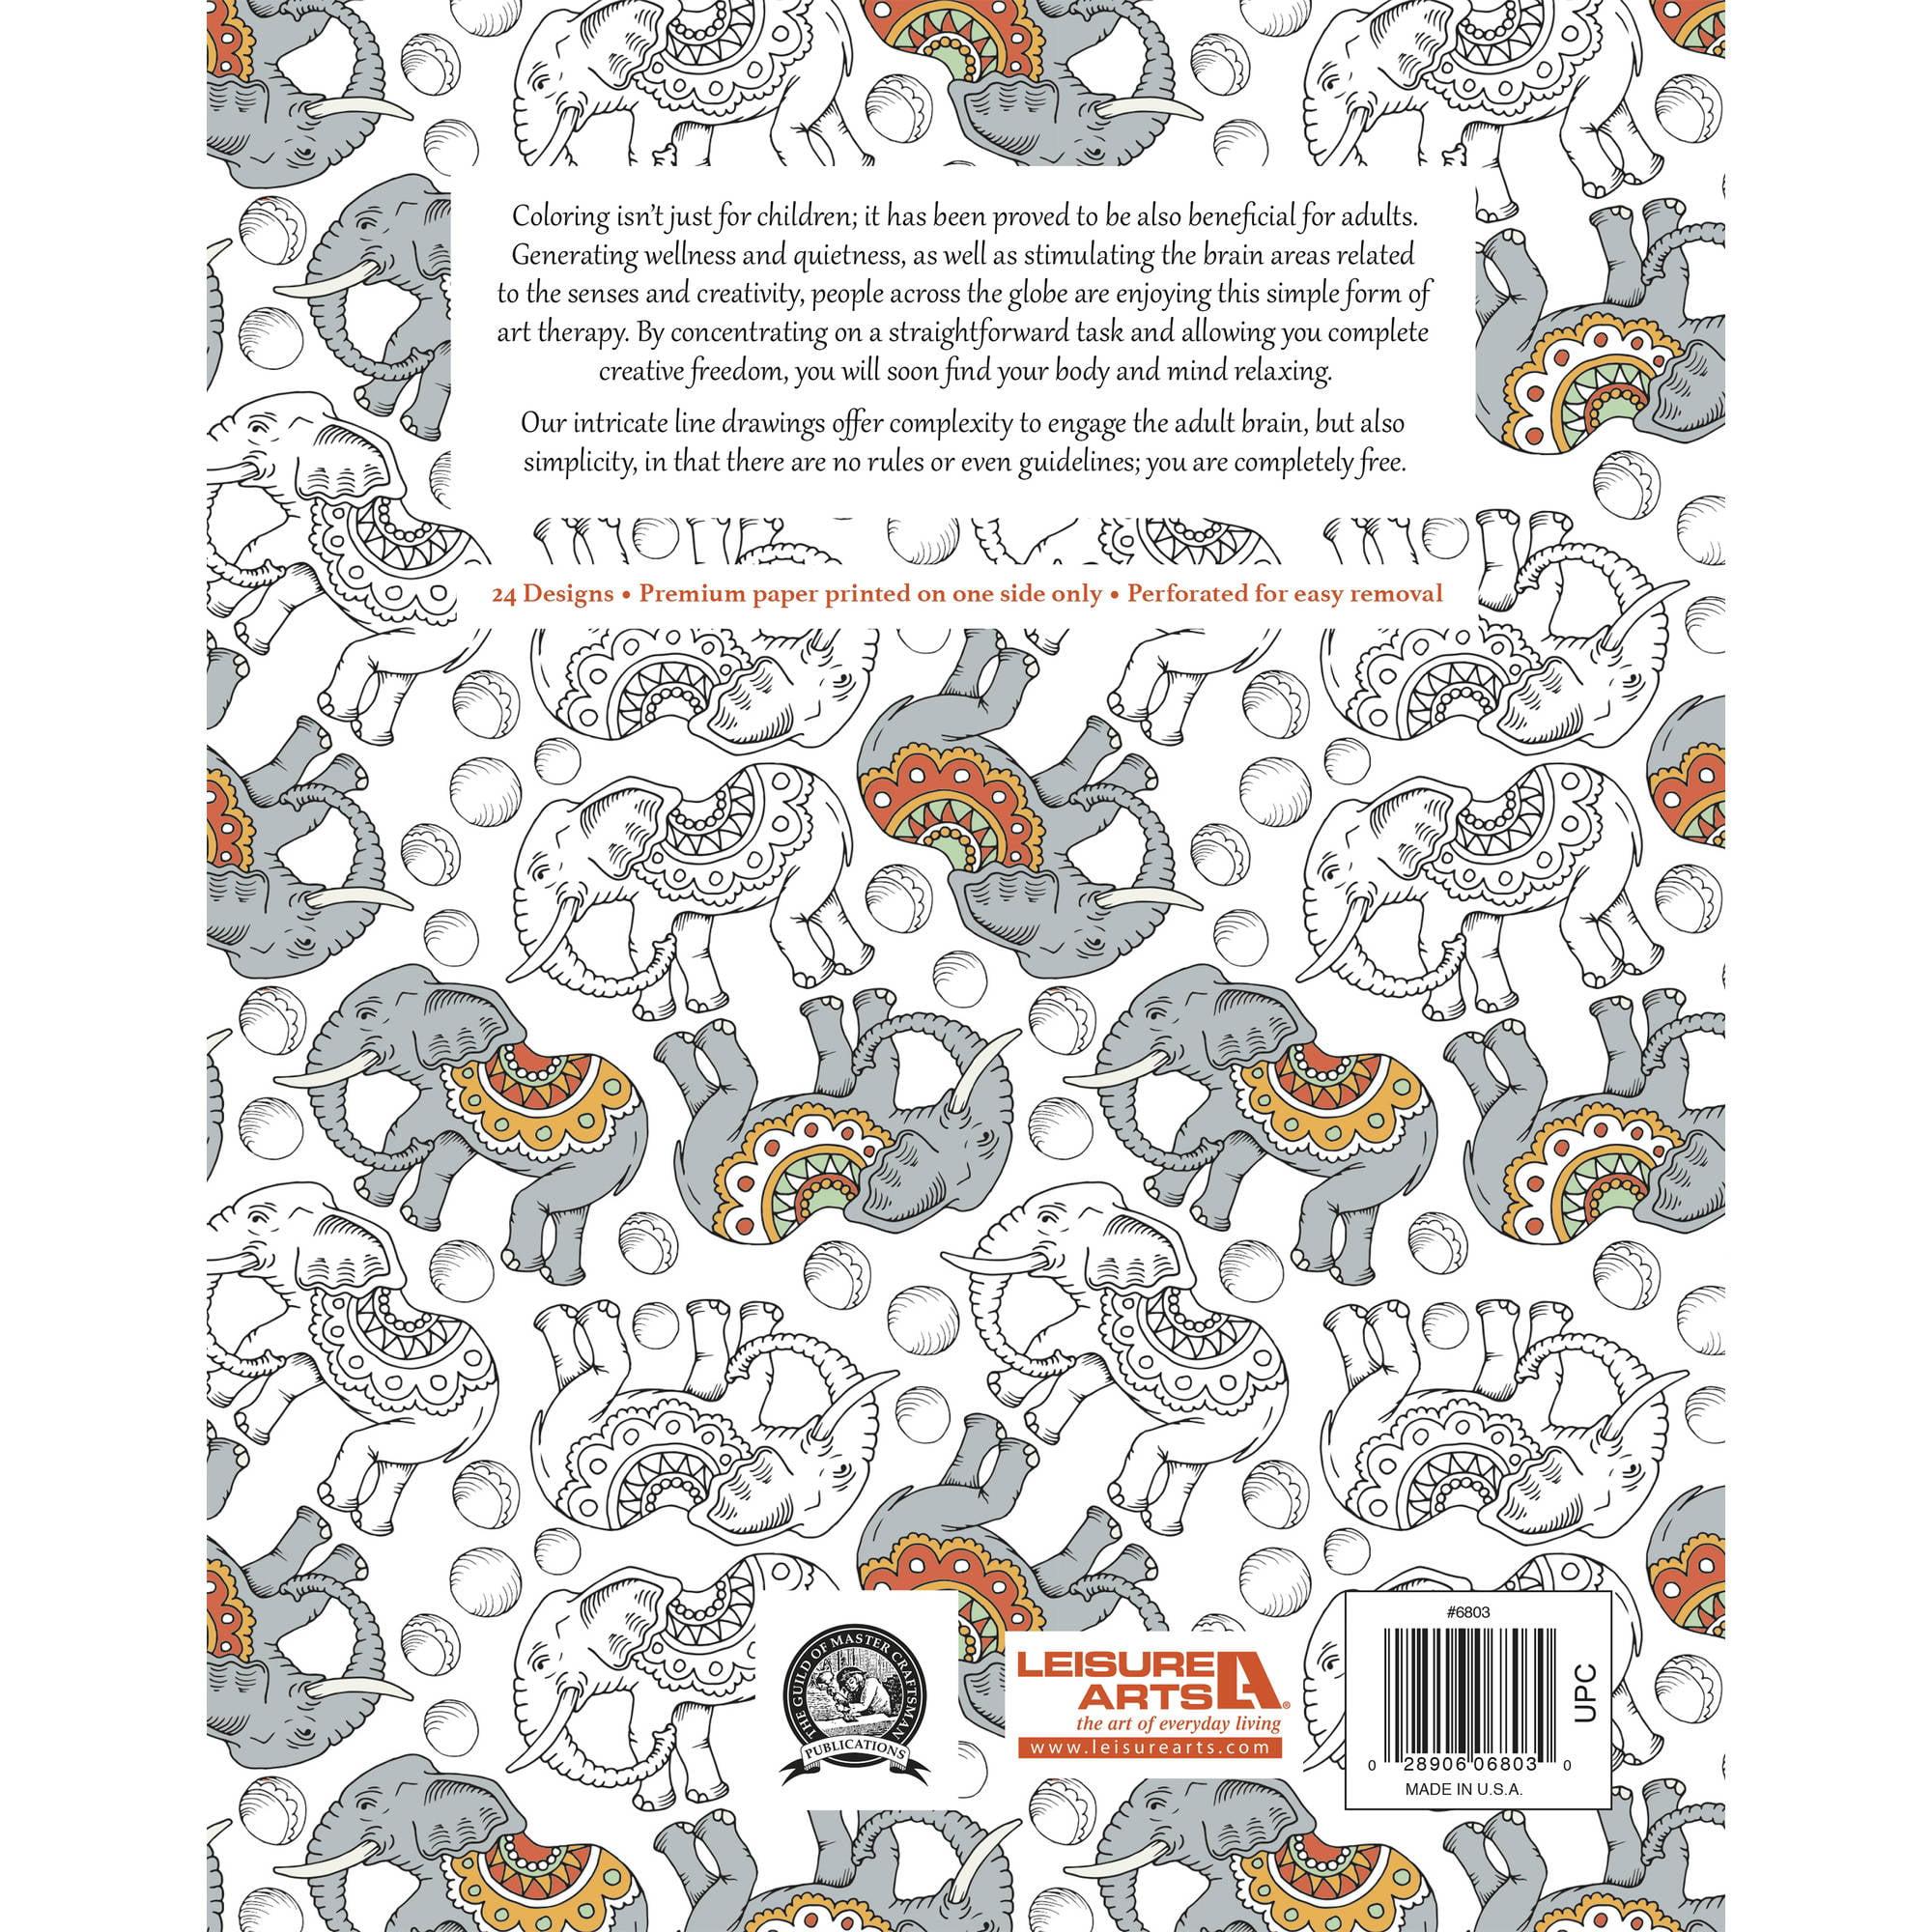 Color art living wonders - Animal Wonders Color Art For Everyone Adult Coloring Book Walmart Com